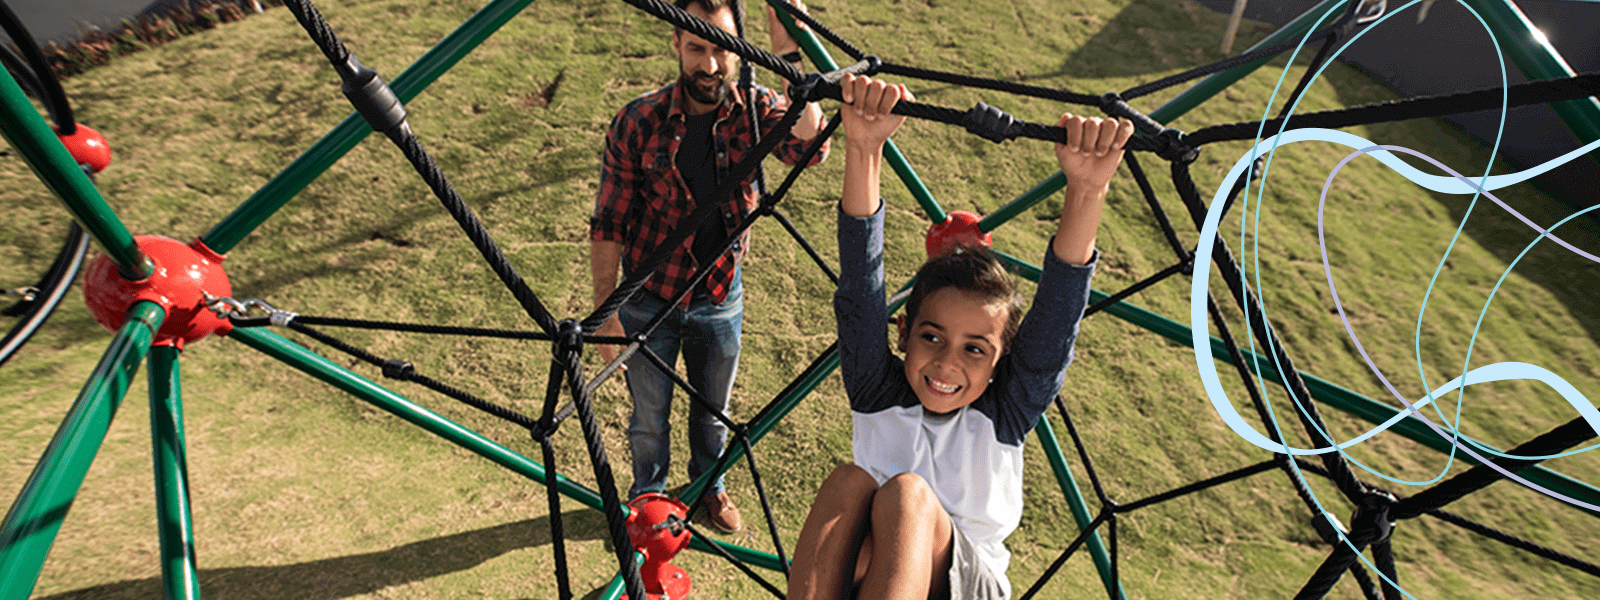 juegos para niños oxigeno playground